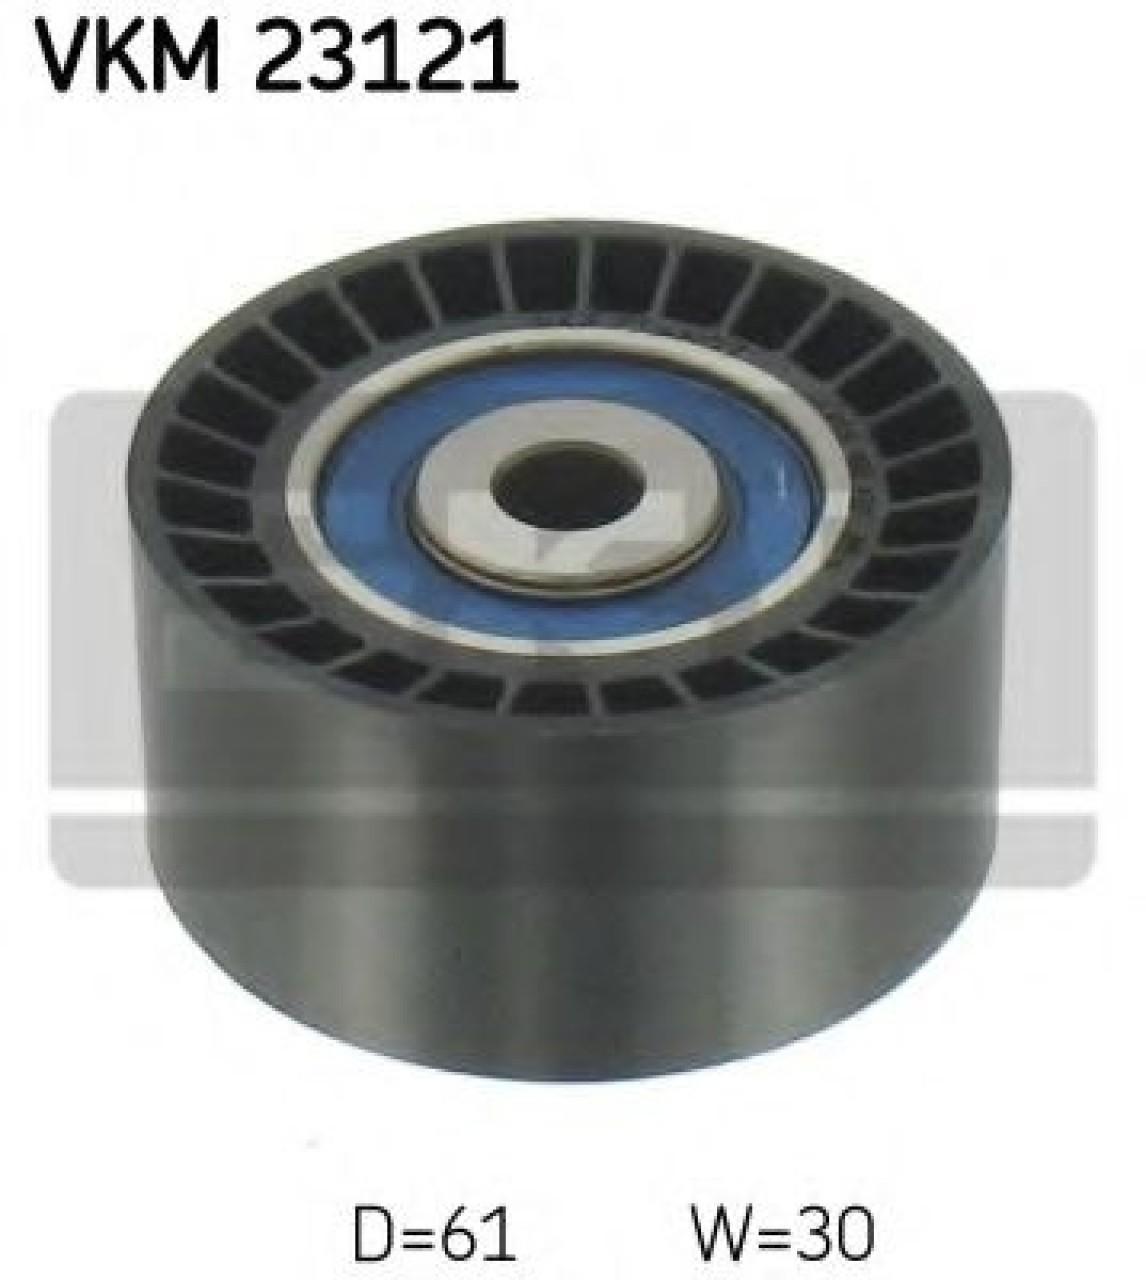 Rola ghidare/conducere, curea distributie CITROEN DS4 (2011 - 2015) SKF VKM 23121 piesa NOUA